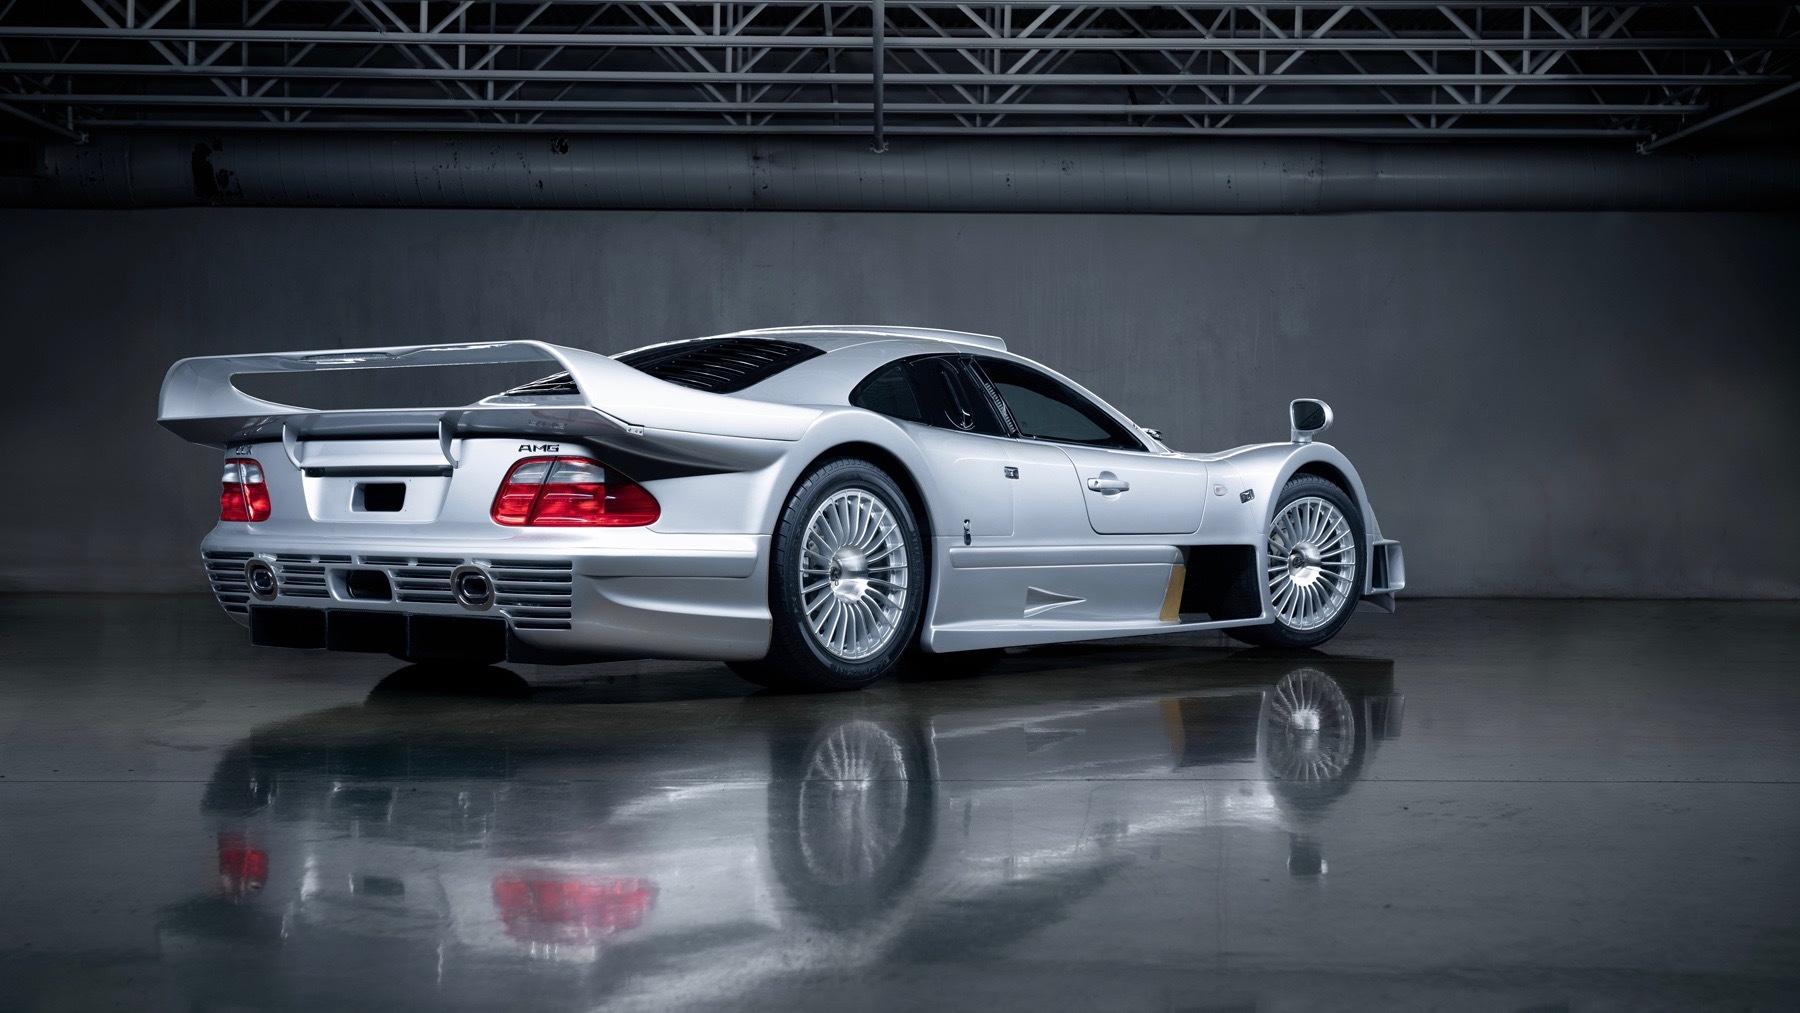 1998 Mercedes-Benz CLK GTR (photo via Gooding & Company)